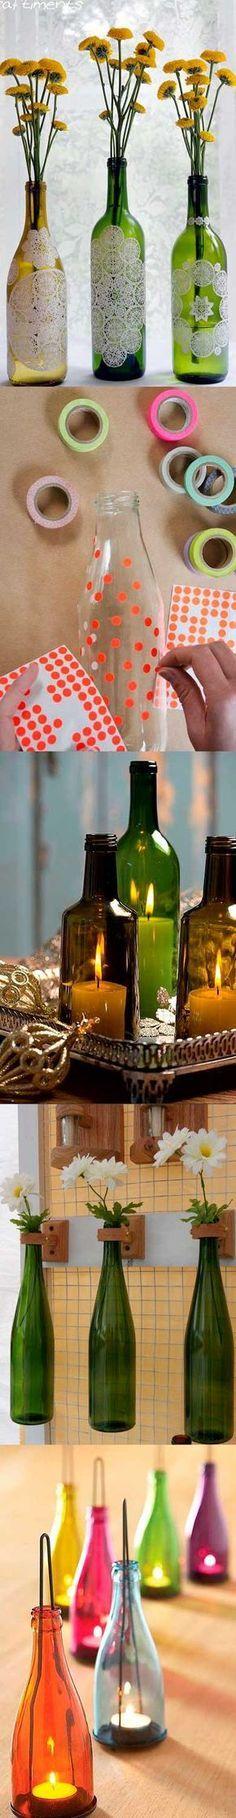 Artesanato Folclorico Do Sul ~ 25+ ideias exclusivas de Potes de vidro decorados no Pinterest Frascos decorados